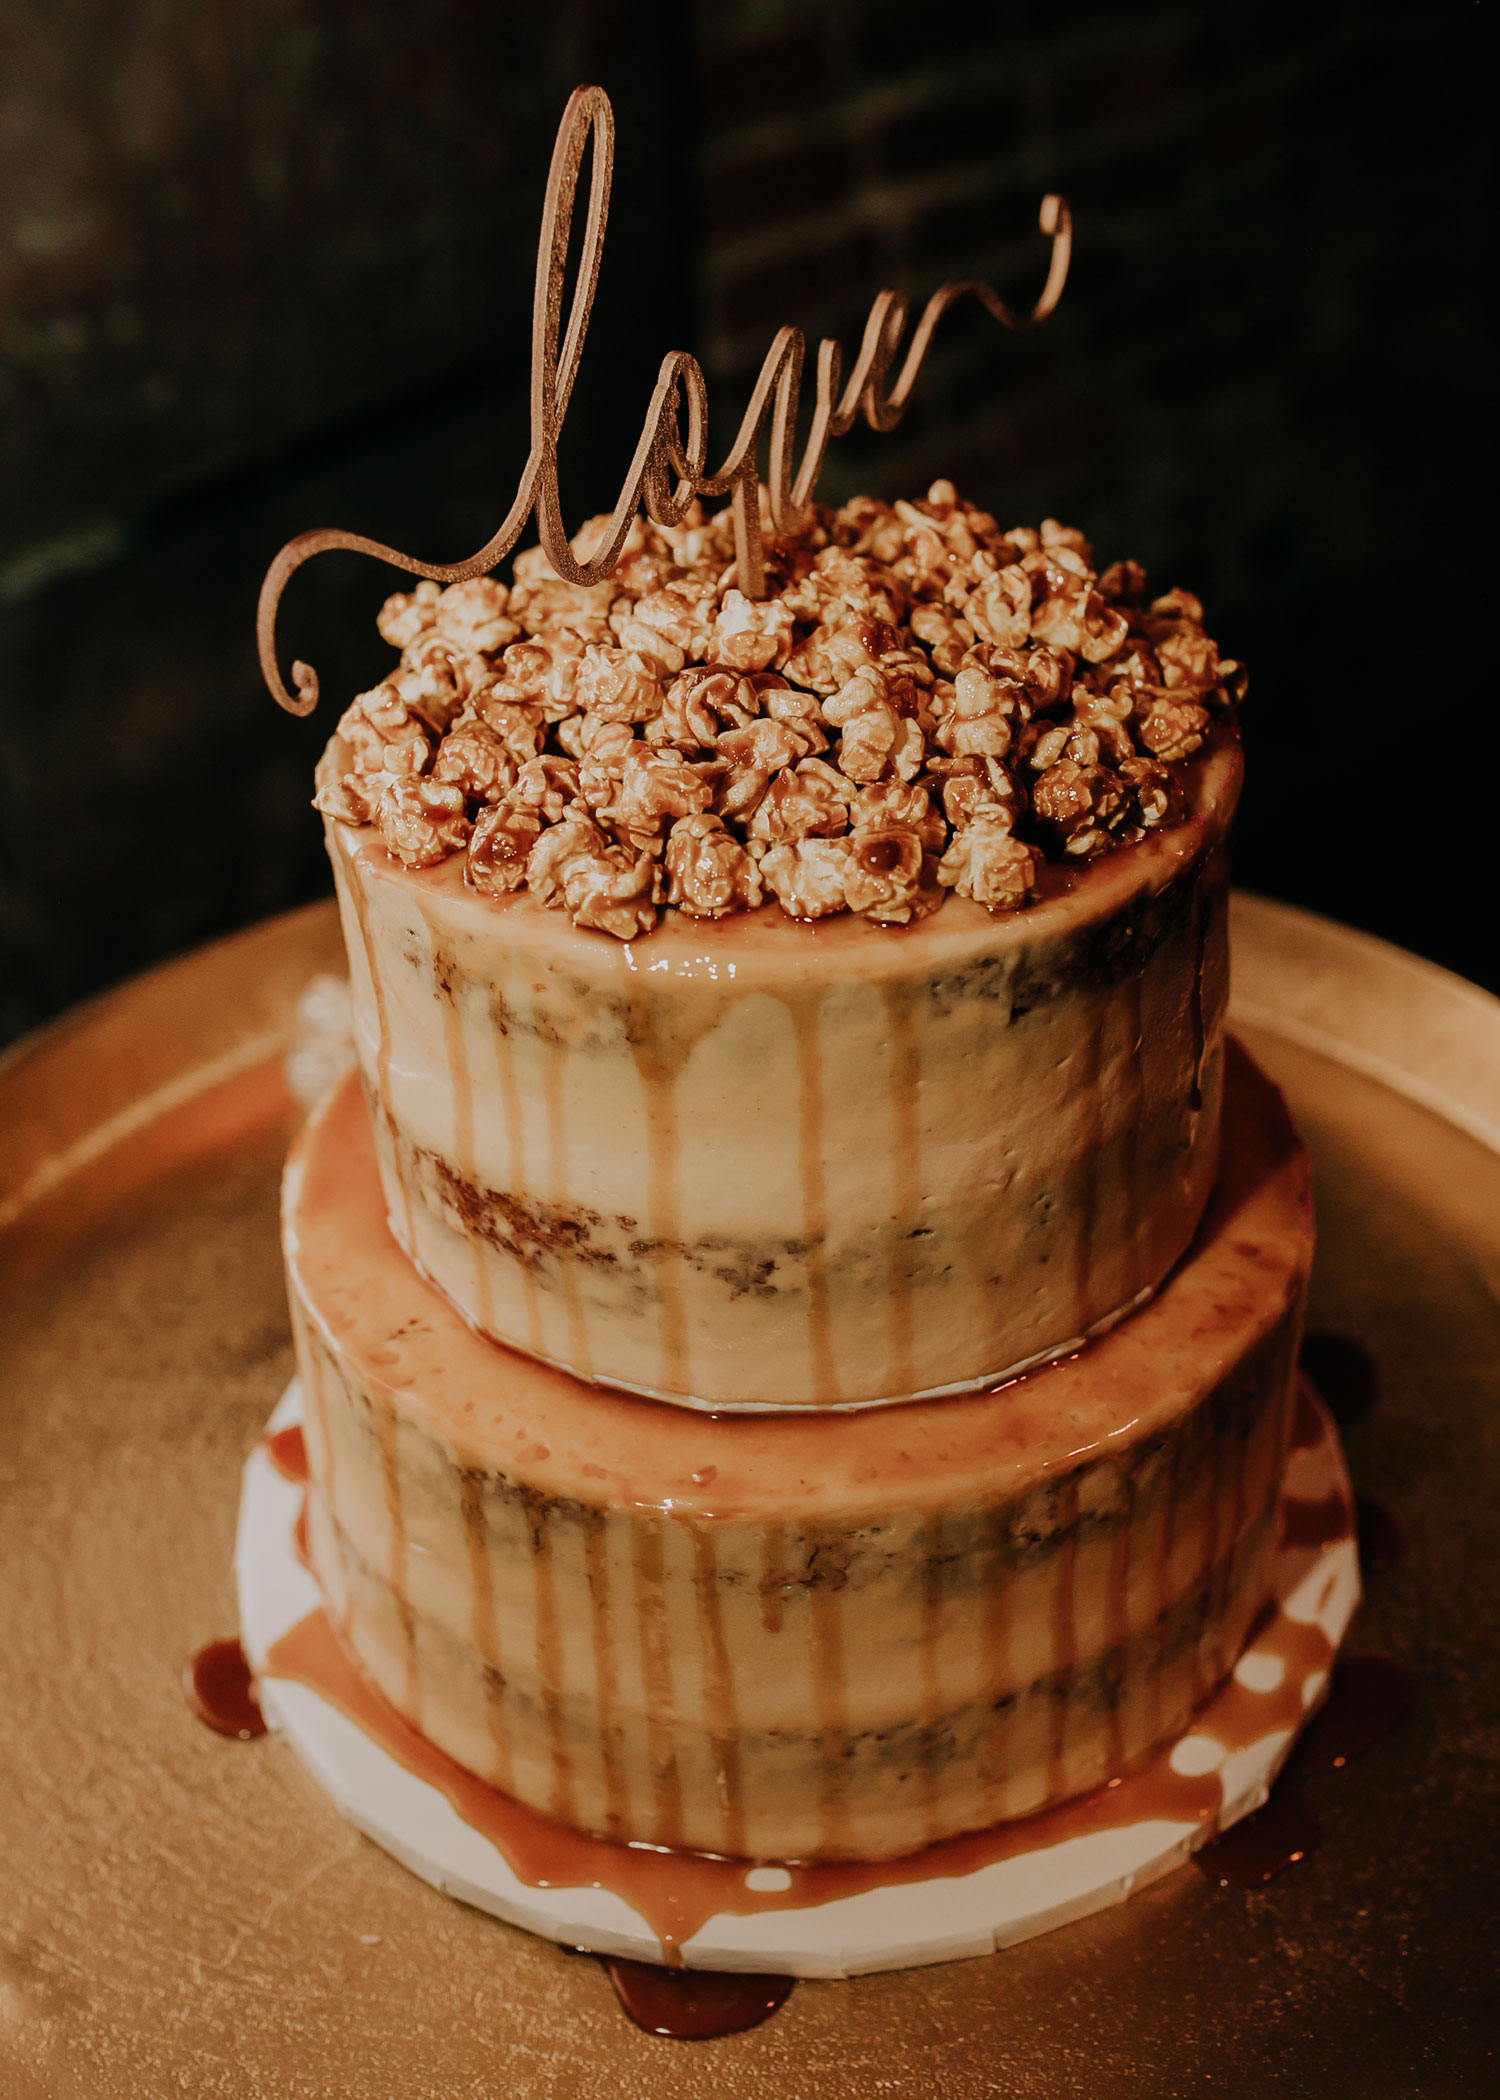 carmel-popcorn-cake-by-cupcake-island-founders-one-nine-omaha-nebraska-raelyn-ramey-photography.jpg